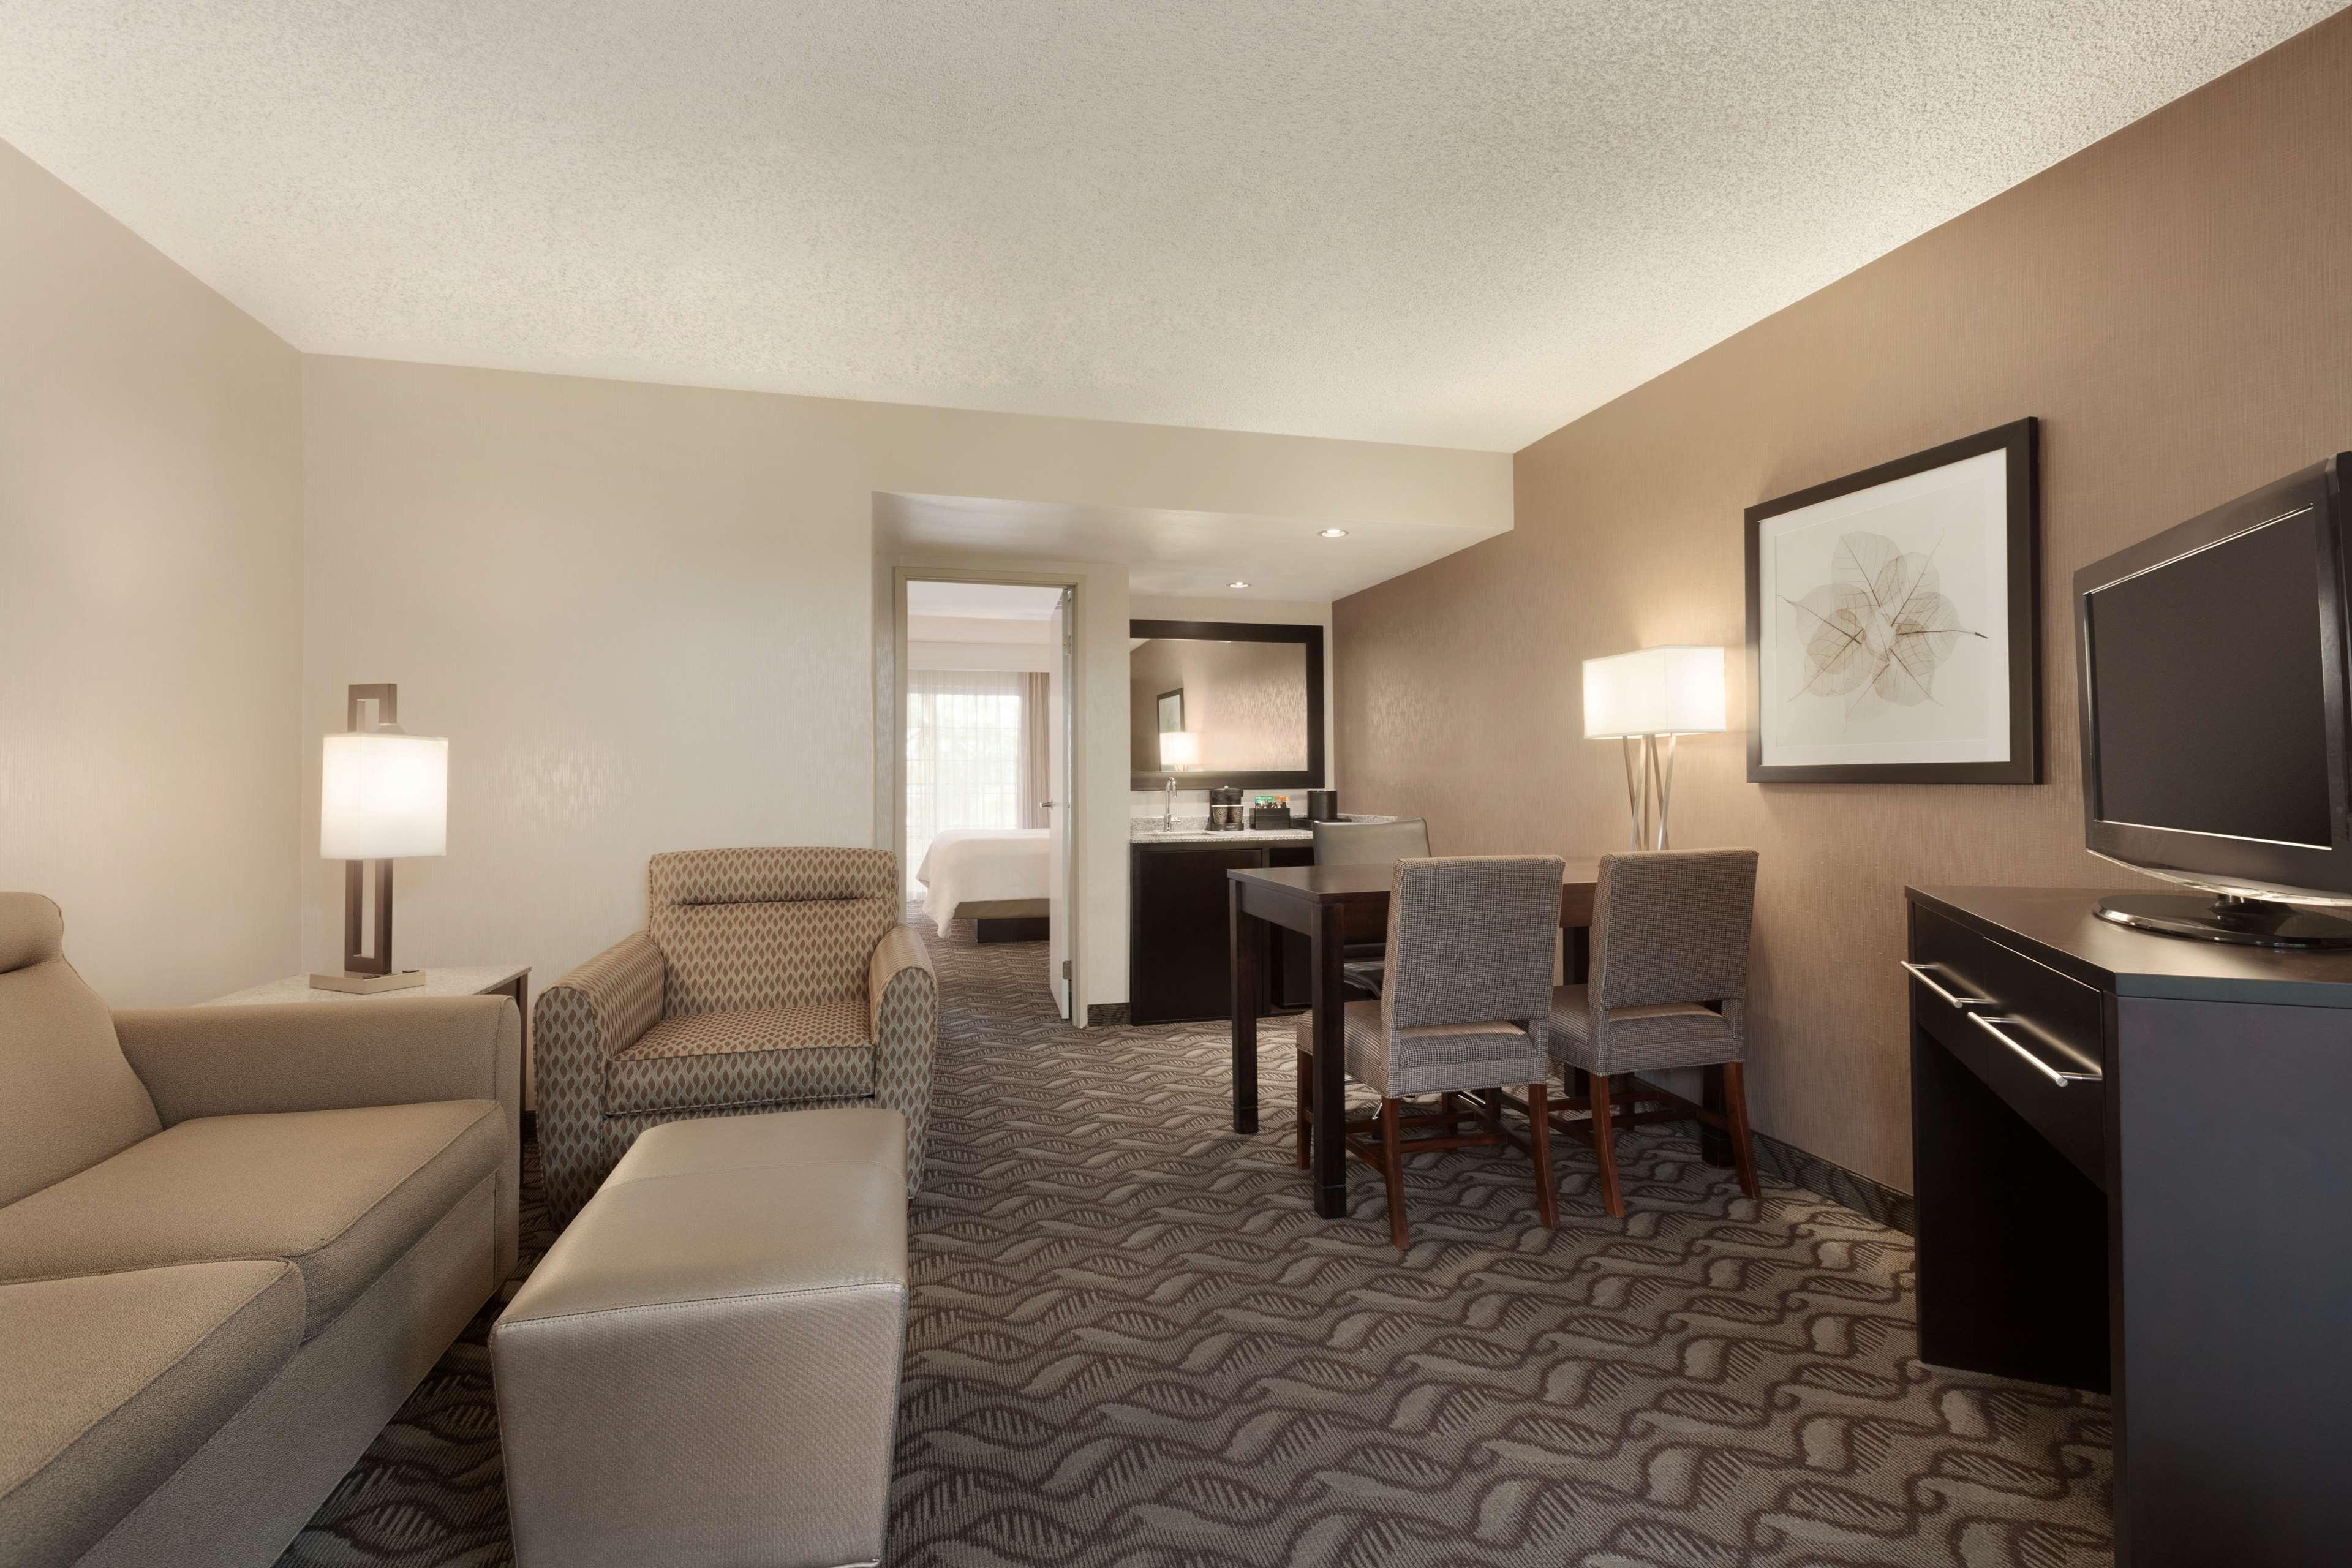 Embassy Suites by Hilton Arcadia Pasadena Area image 22